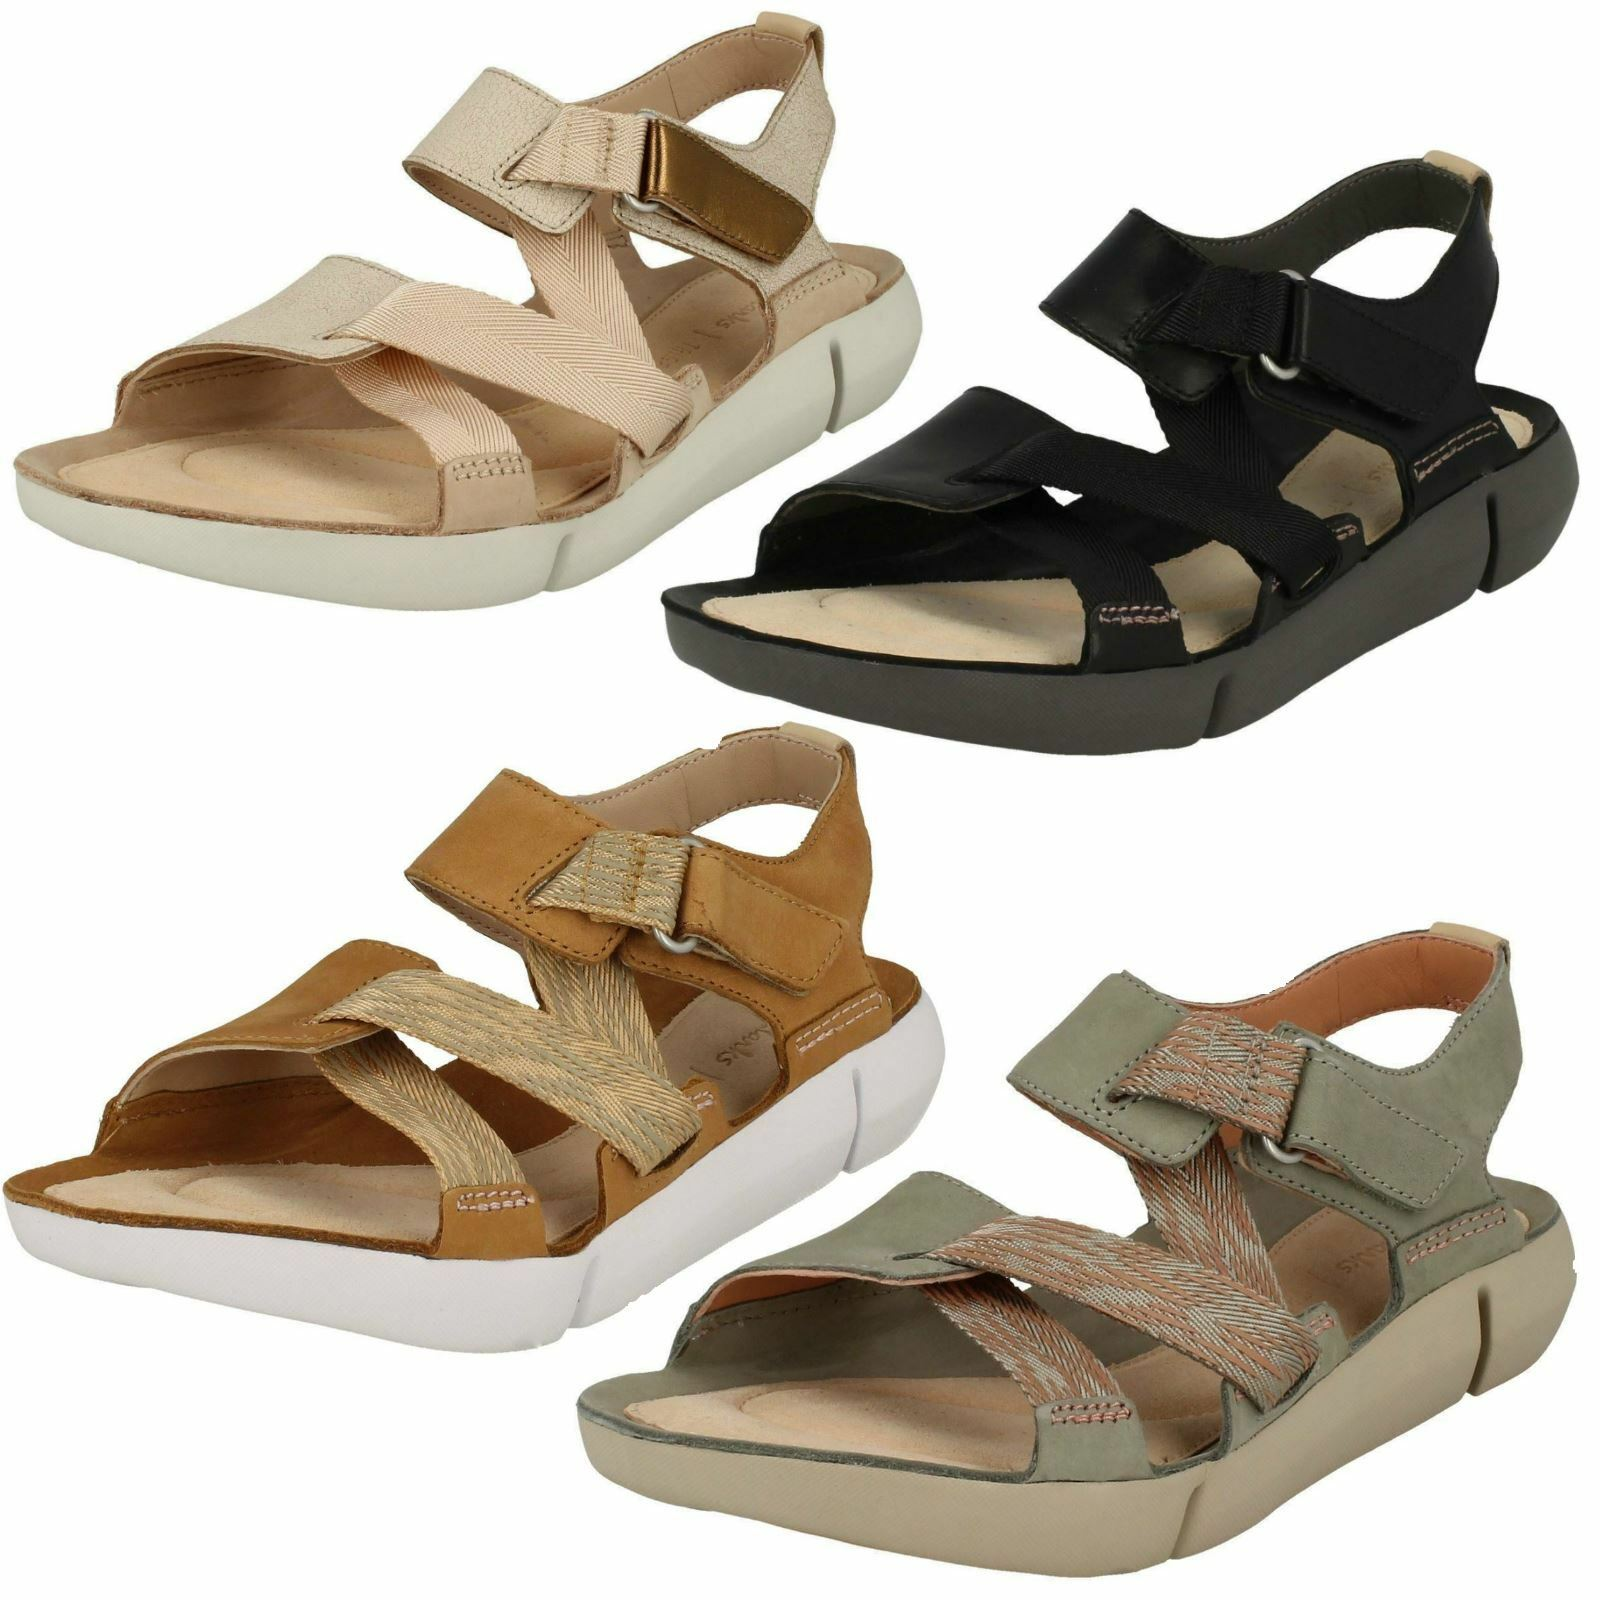 Sandalo Sandalo Sandalo Donna Clarks Sportivo TRI Clover Clover TRI 5a7e1b smarmie  7673bc